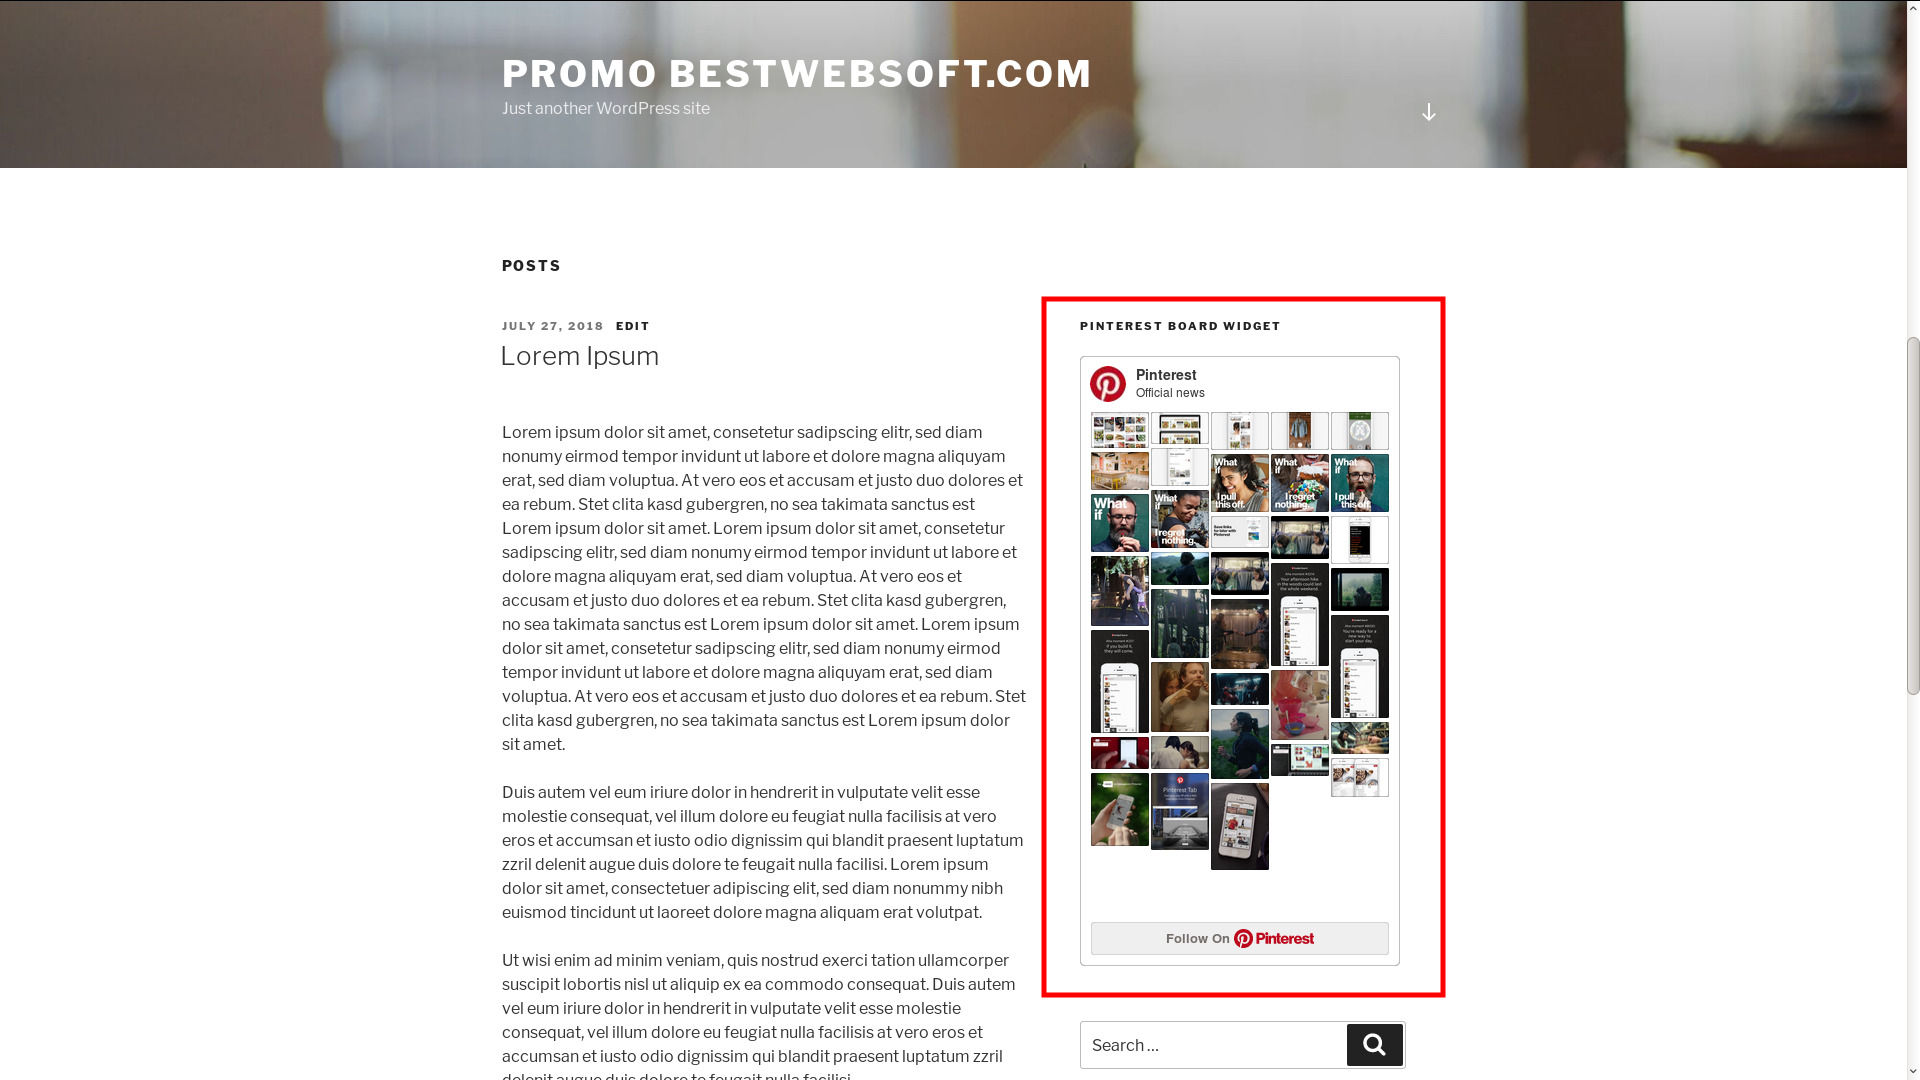 Displaying Pinterest Board widget.